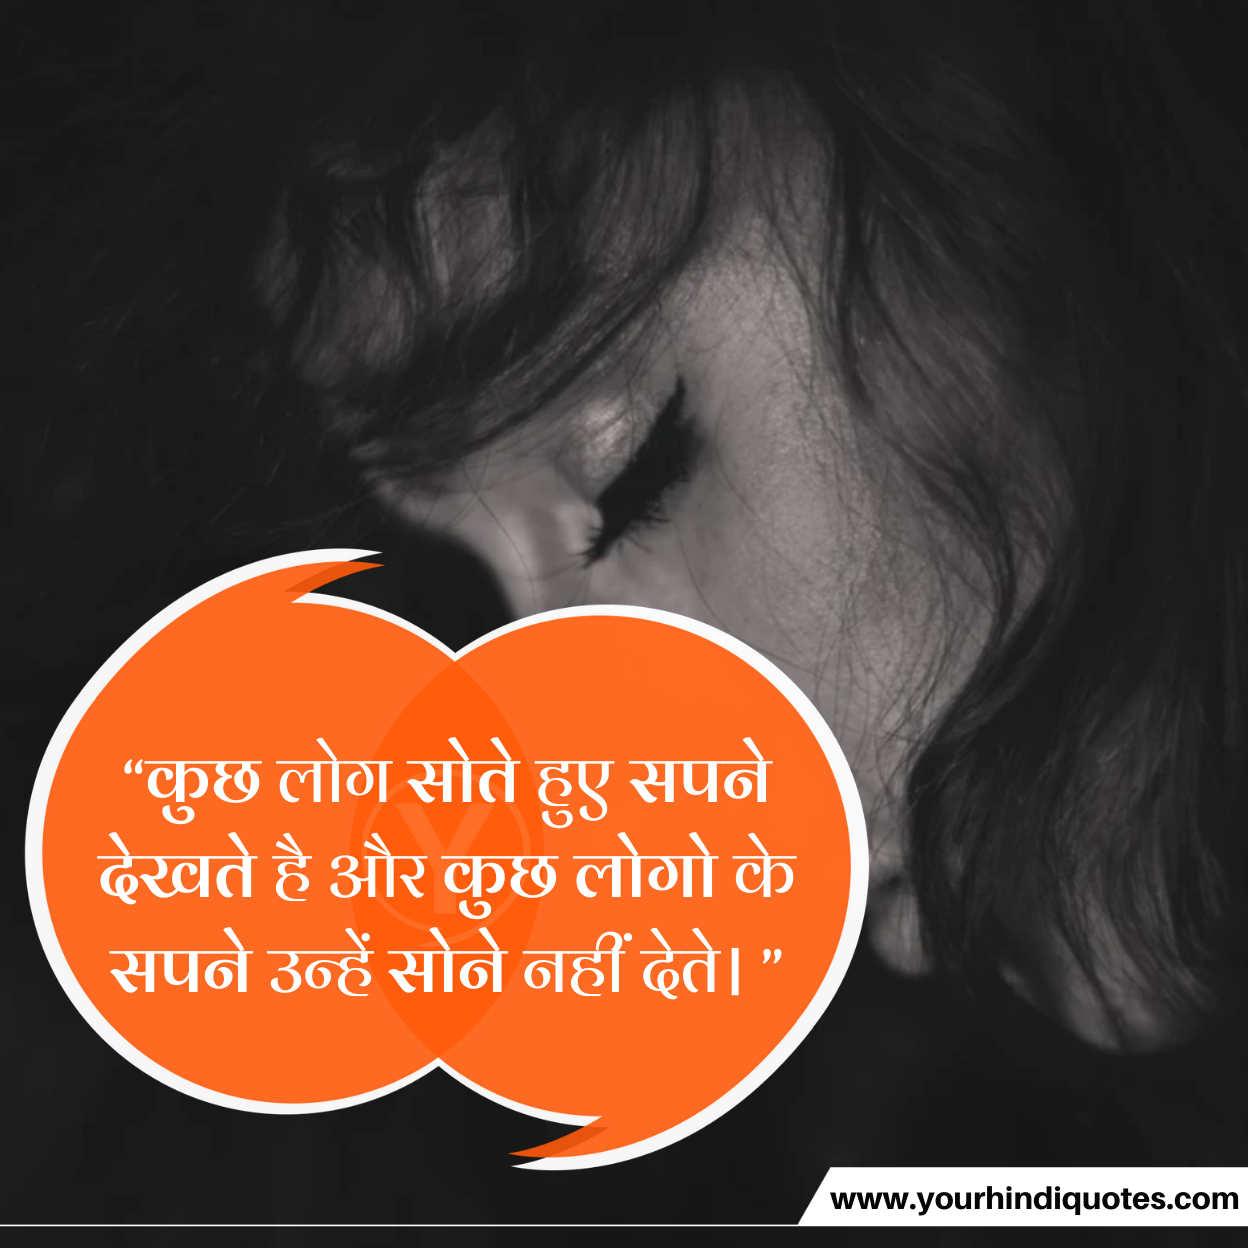 Hindi Motivational Thoughts Images